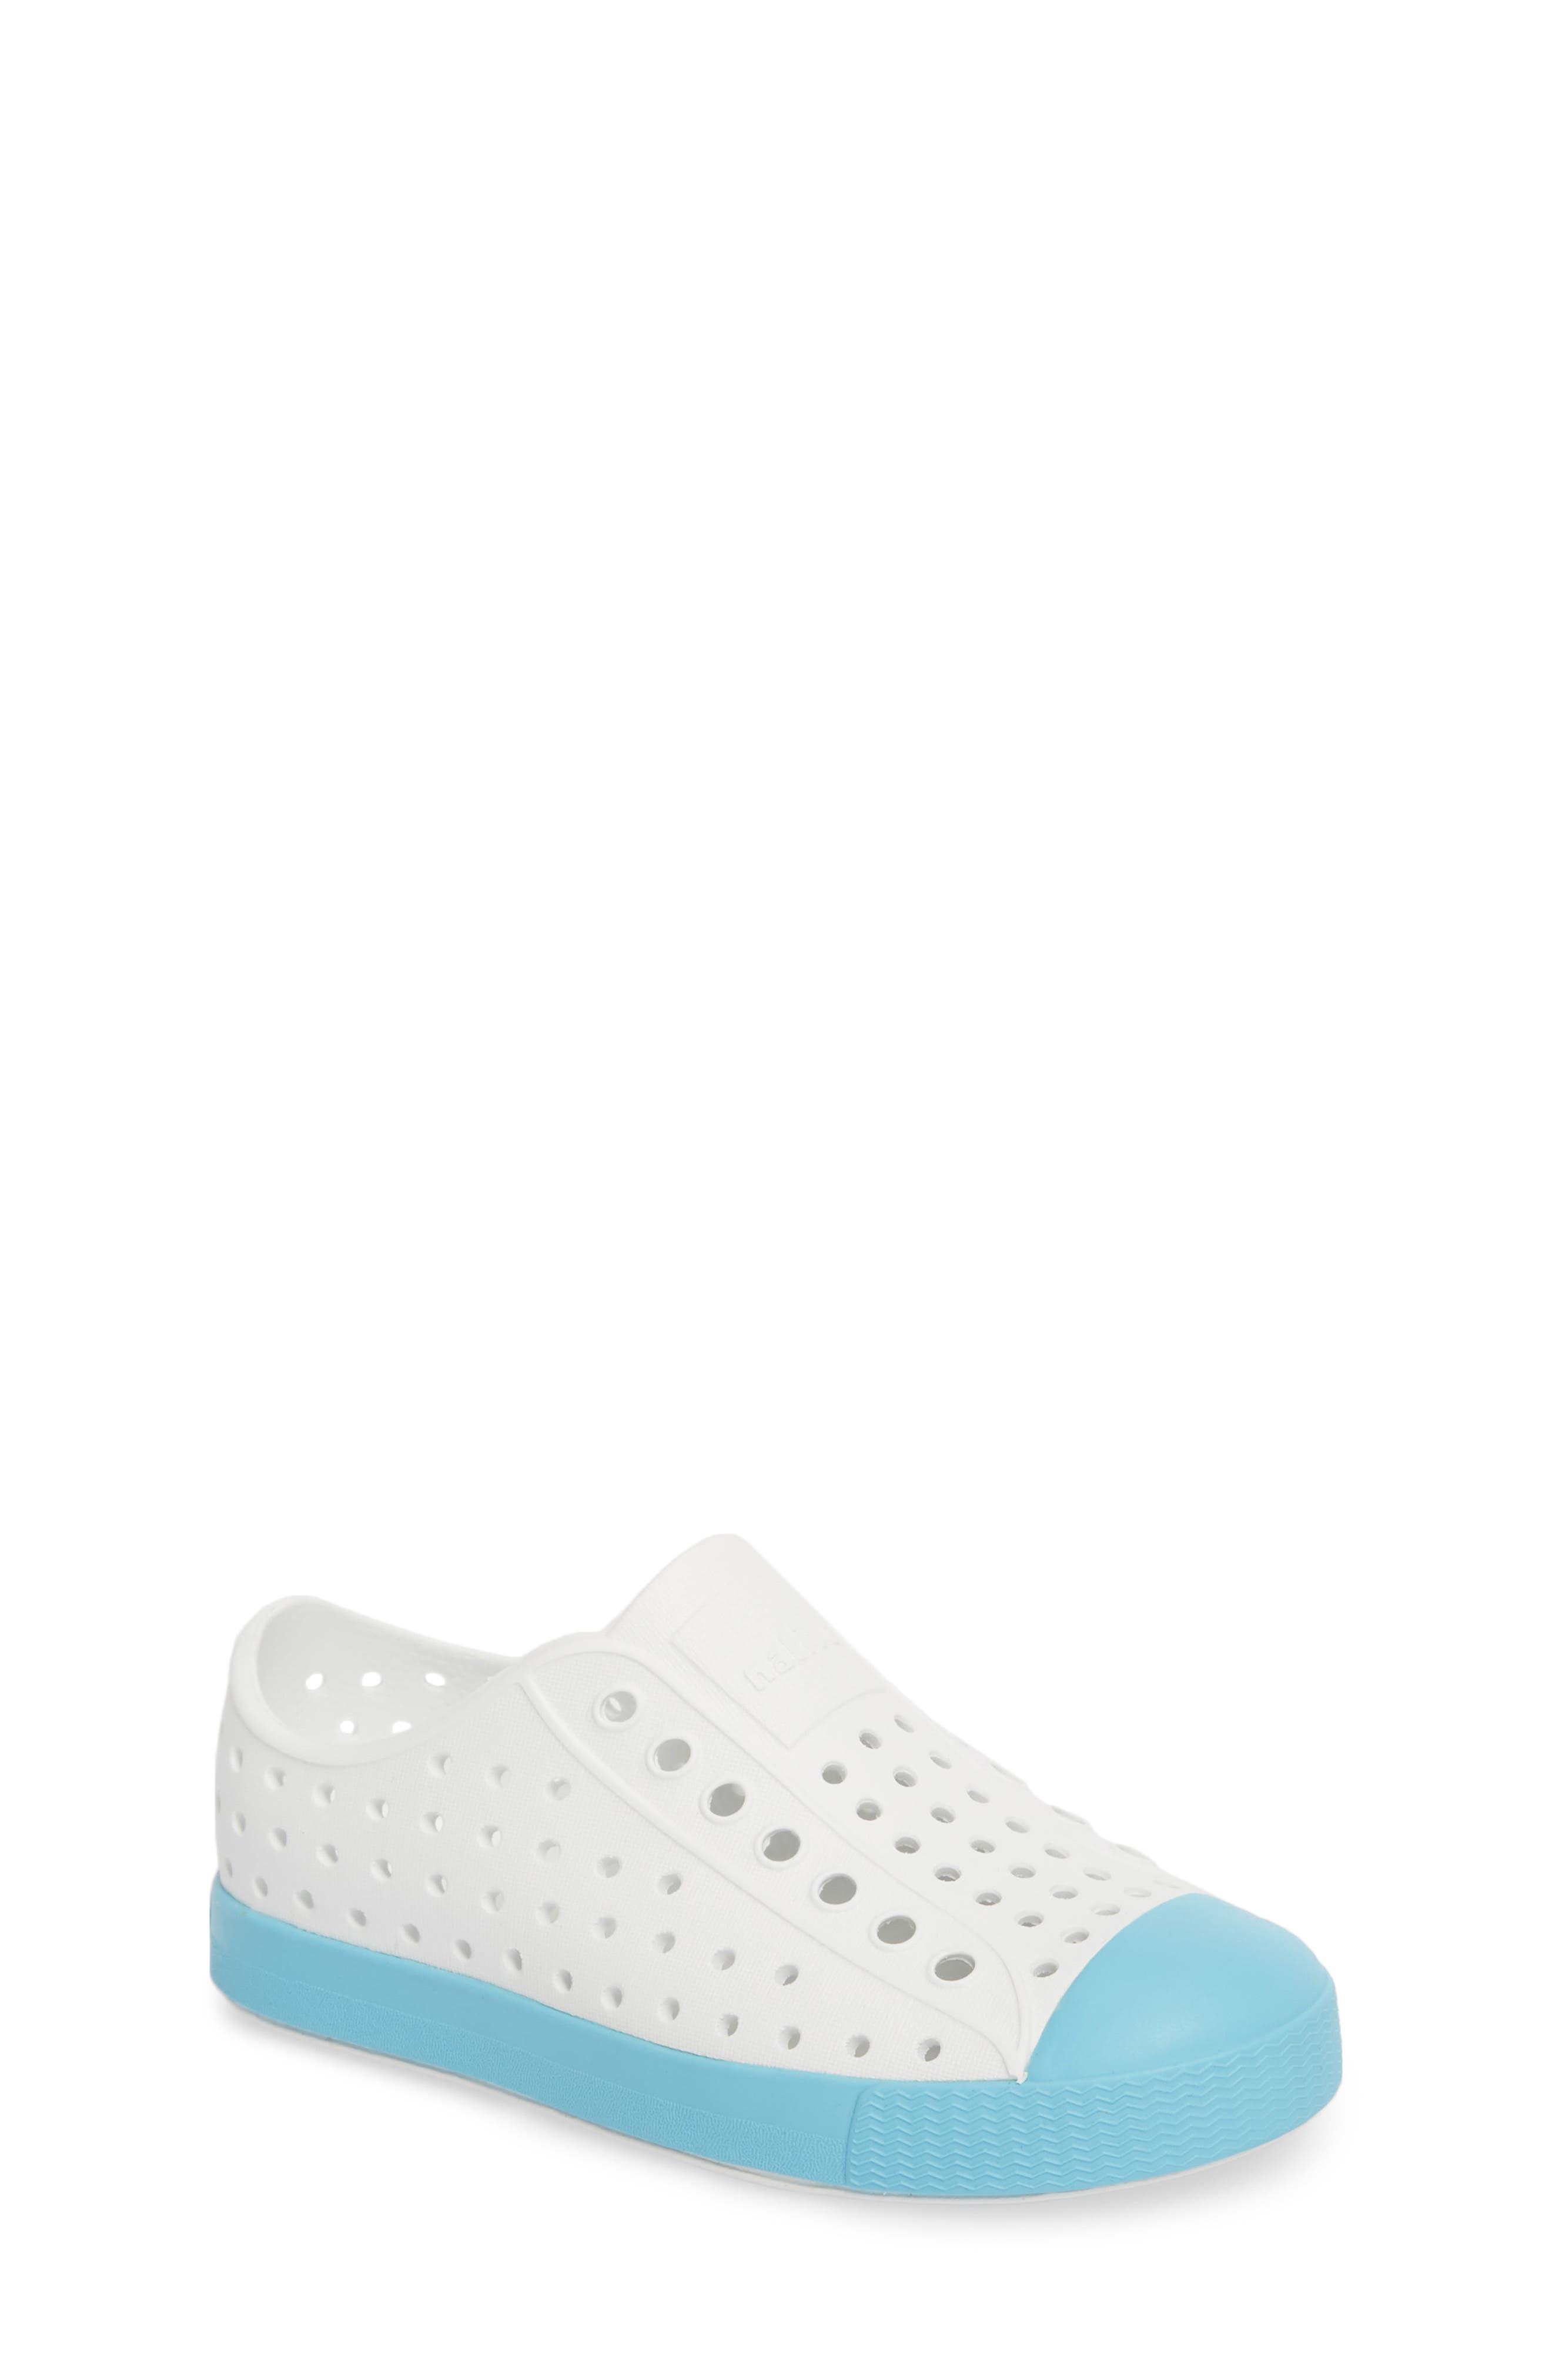 'Jefferson' Water Friendly Slip-On Sneaker,                             Main thumbnail 16, color,